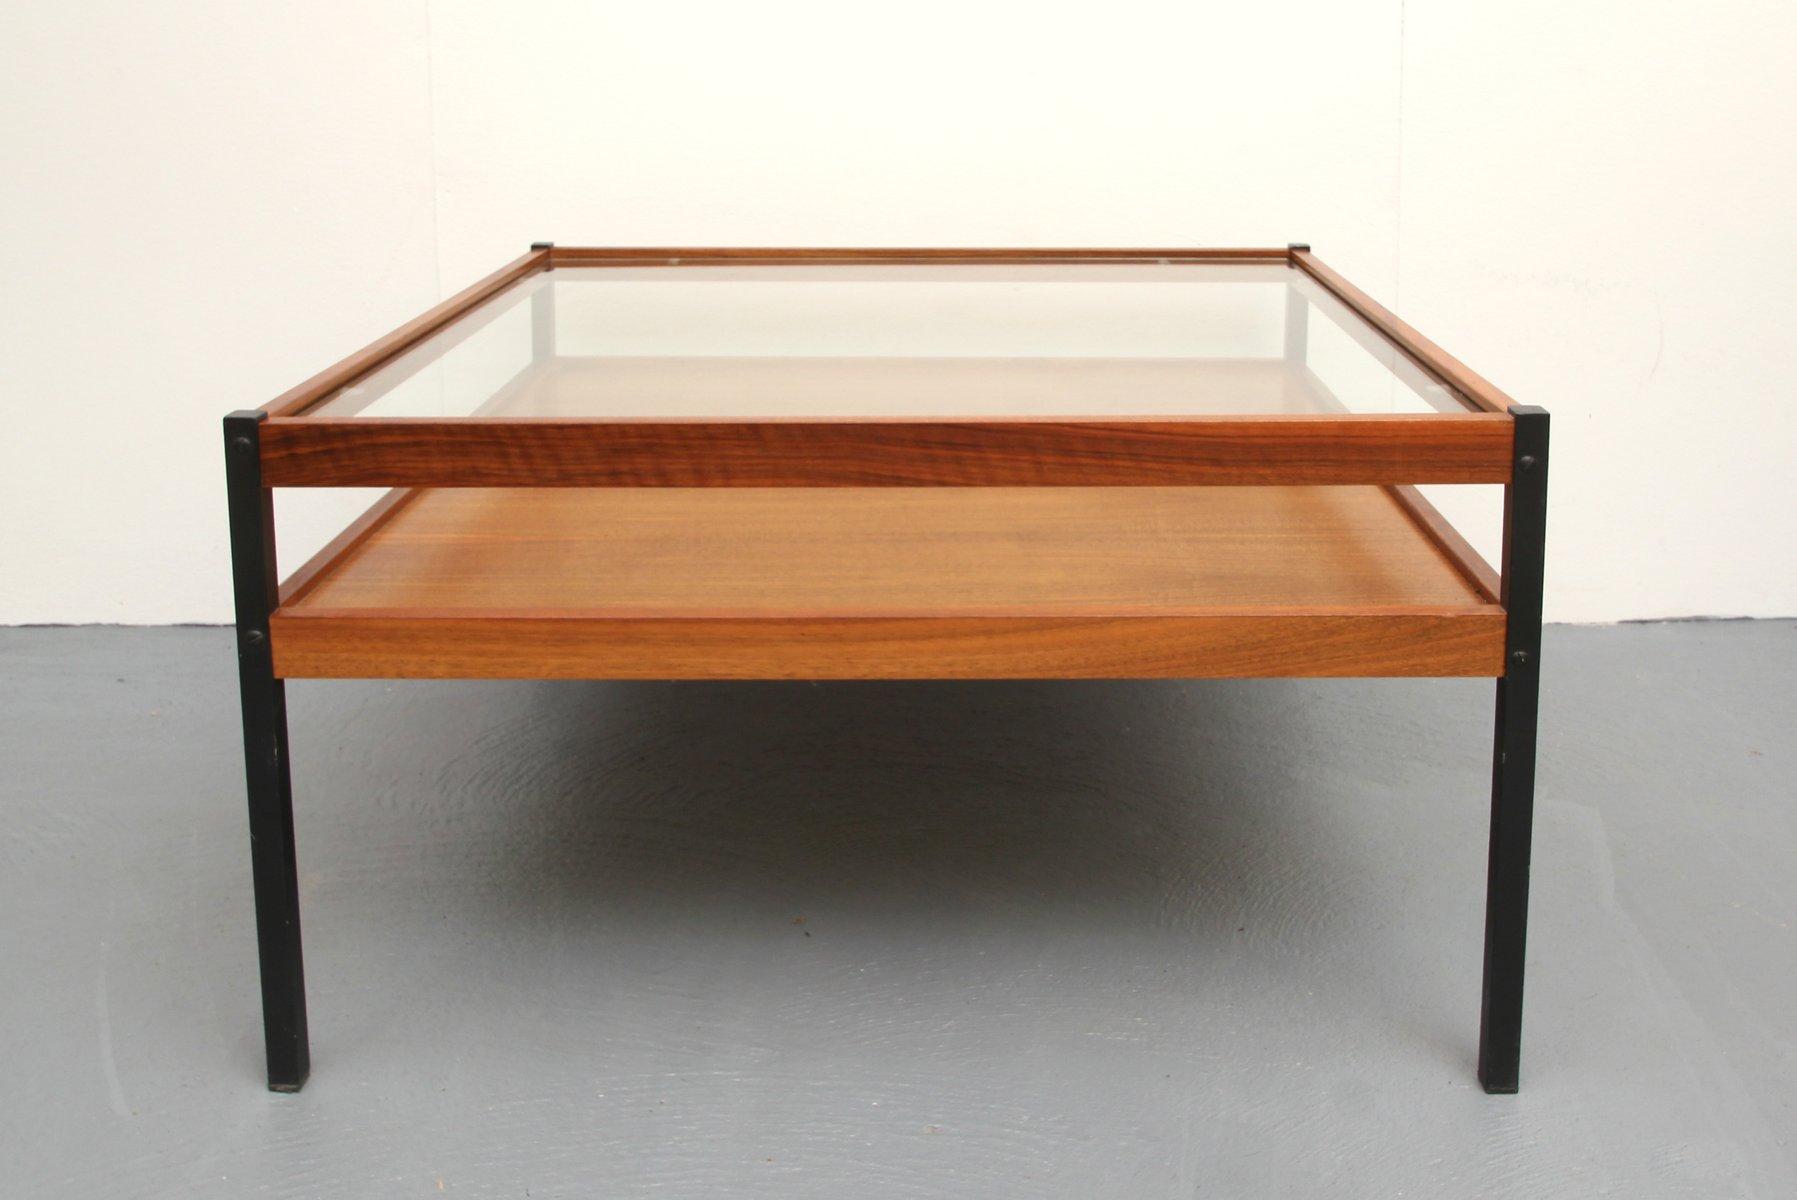 Walnut Veneer Glass Coffee Table 1960s For Sale At Pamono